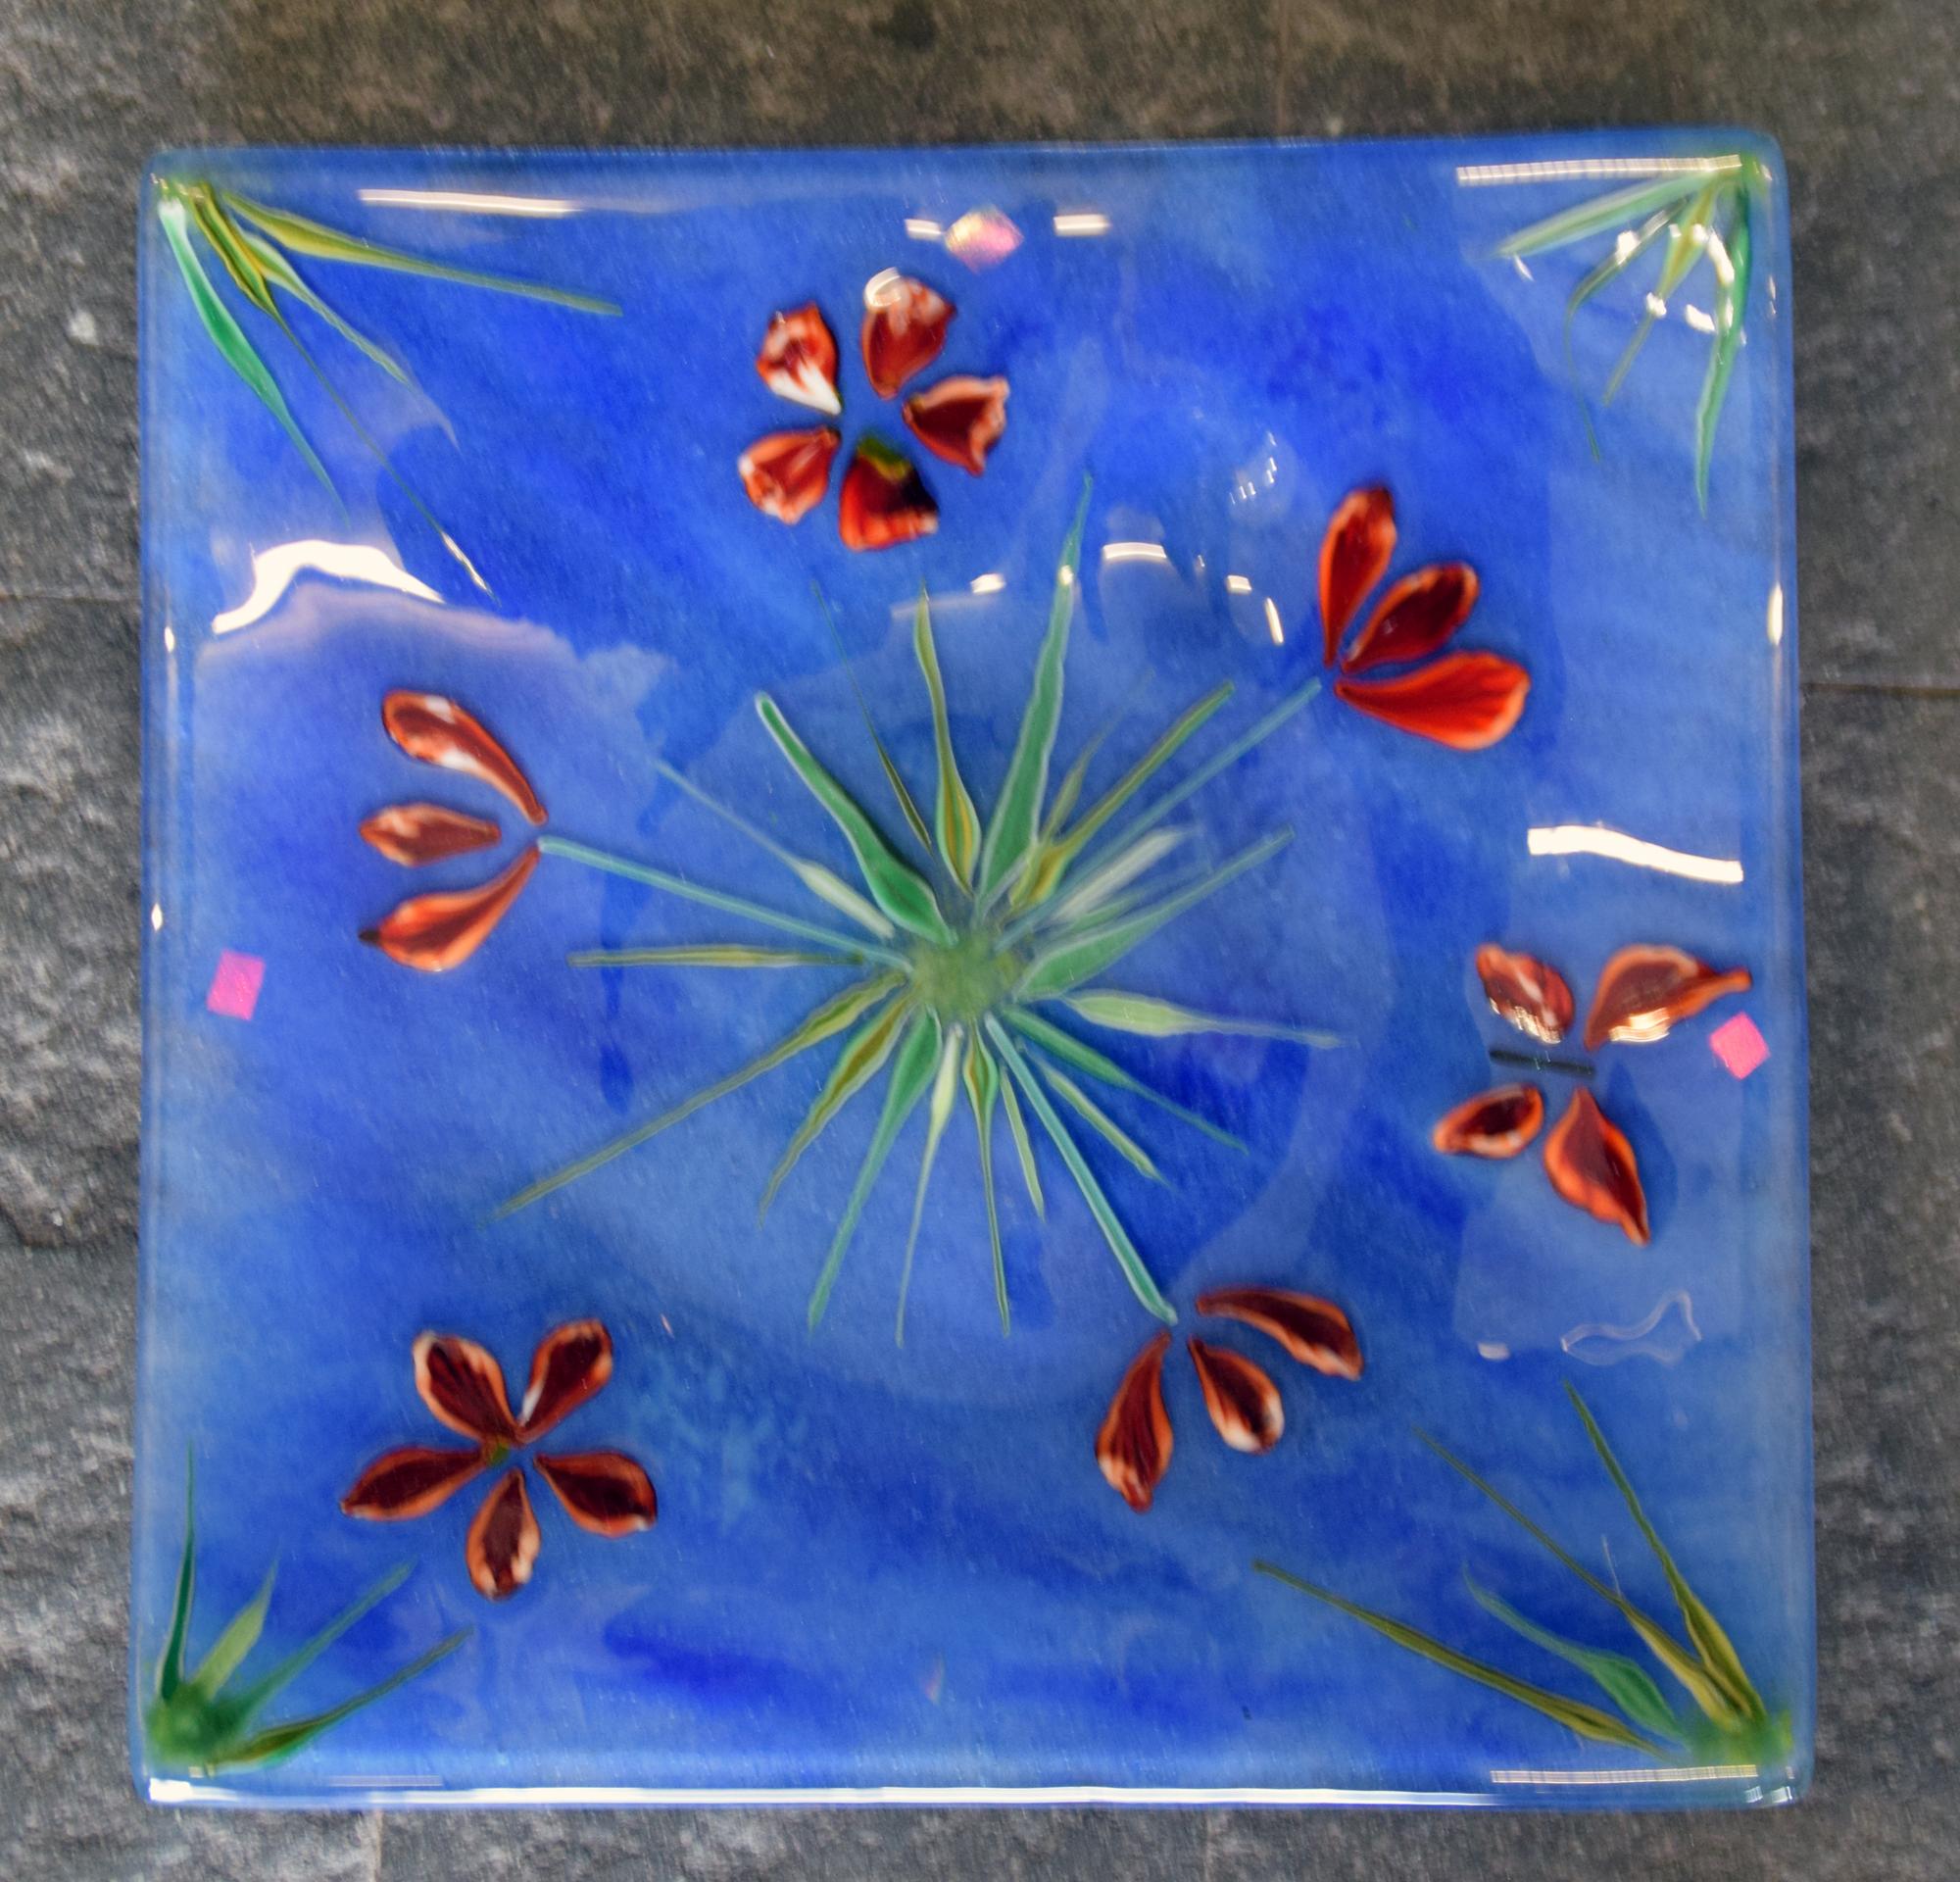 Square plate, blue